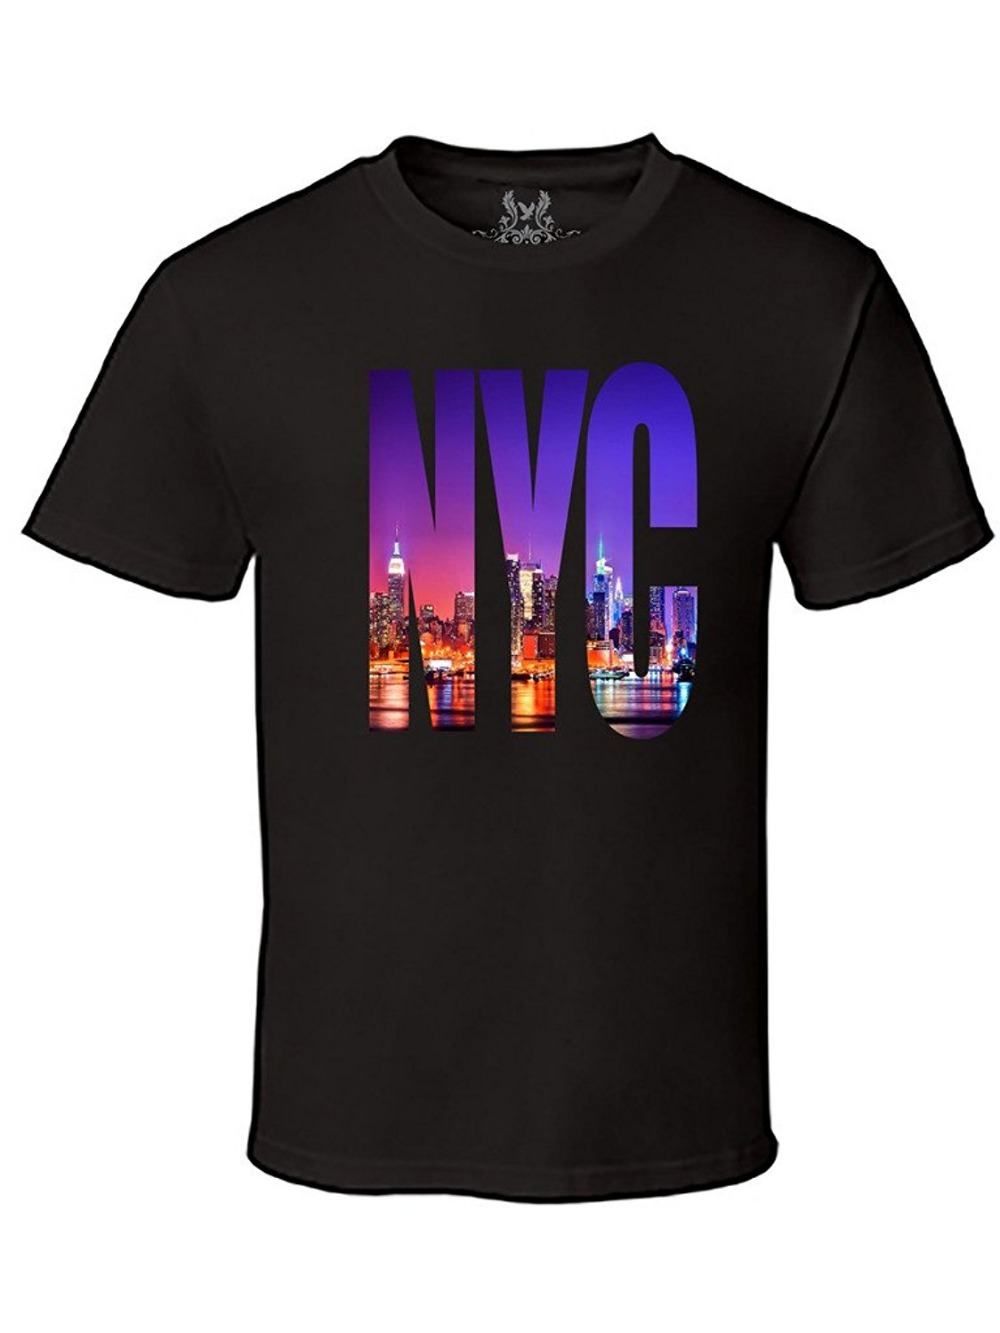 Design a t shirt nyc - 2017 Fashion Casual Streetwear Men S Printed New York City Nyc Graphic Design T Shirt Men S